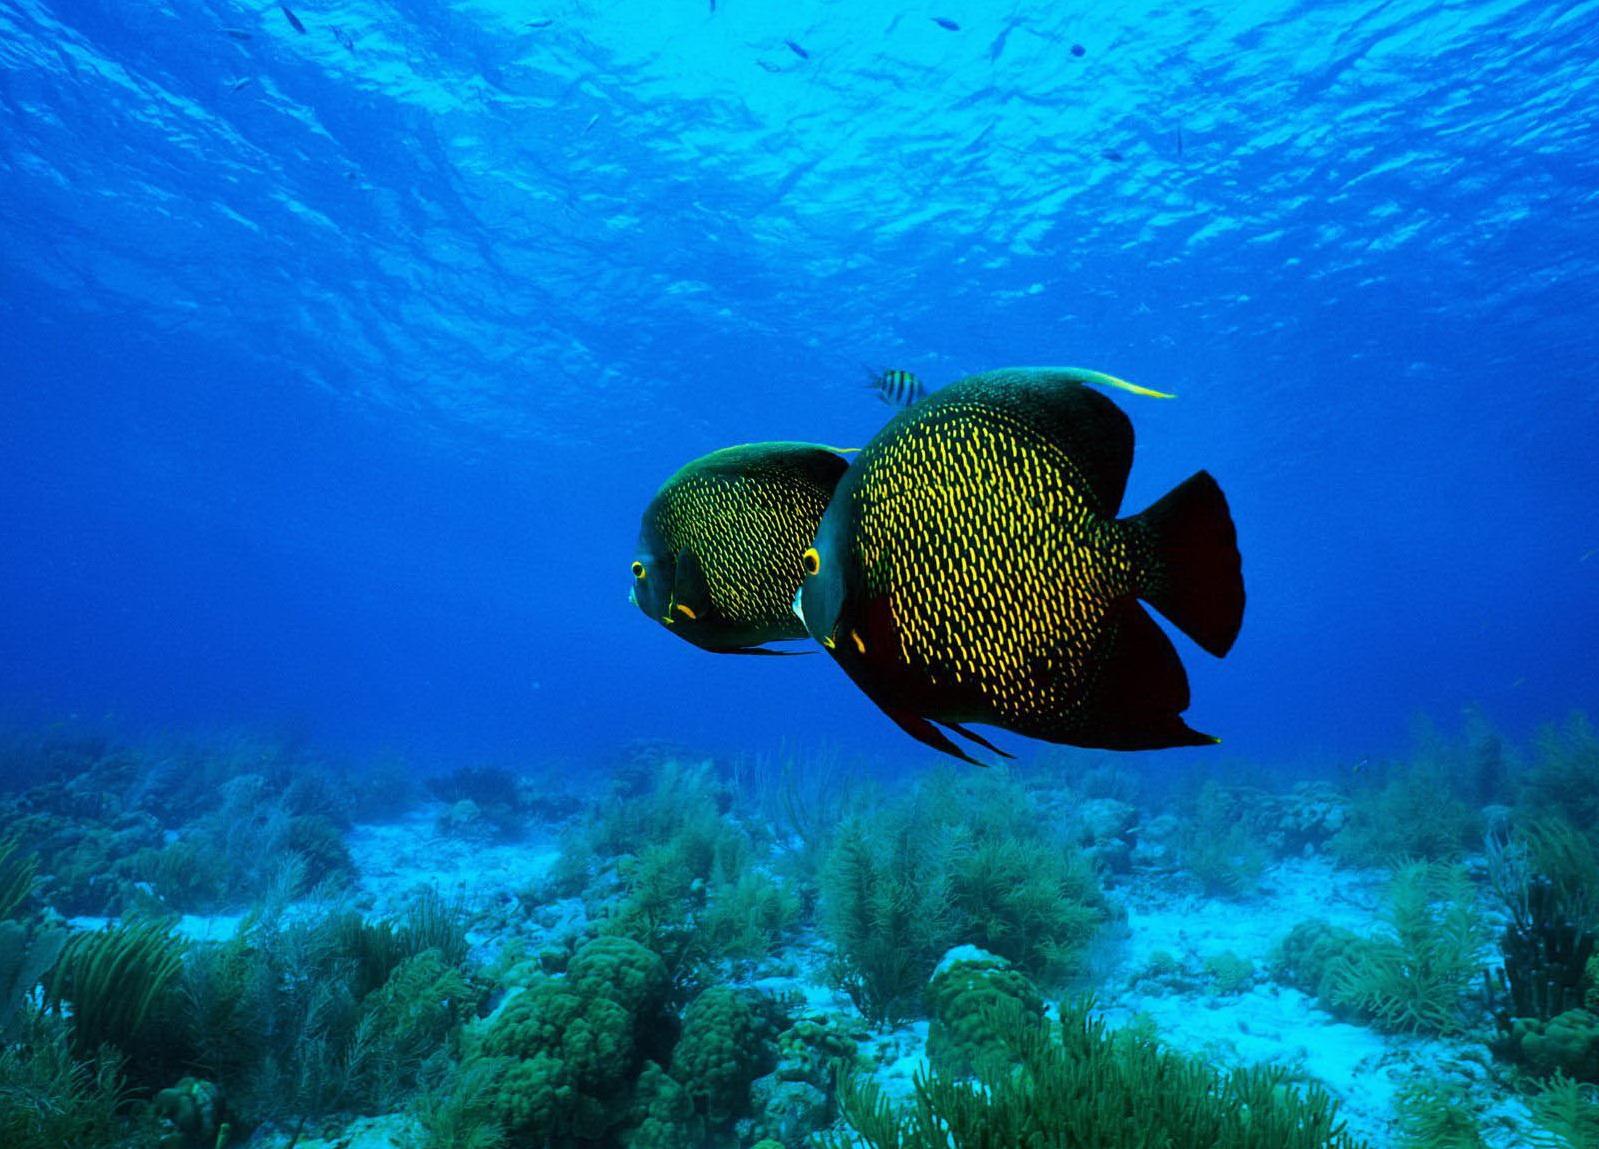 116451 ocean life wallpaper ocean life wallpaper wallpapers 1600x1200 1599x1149